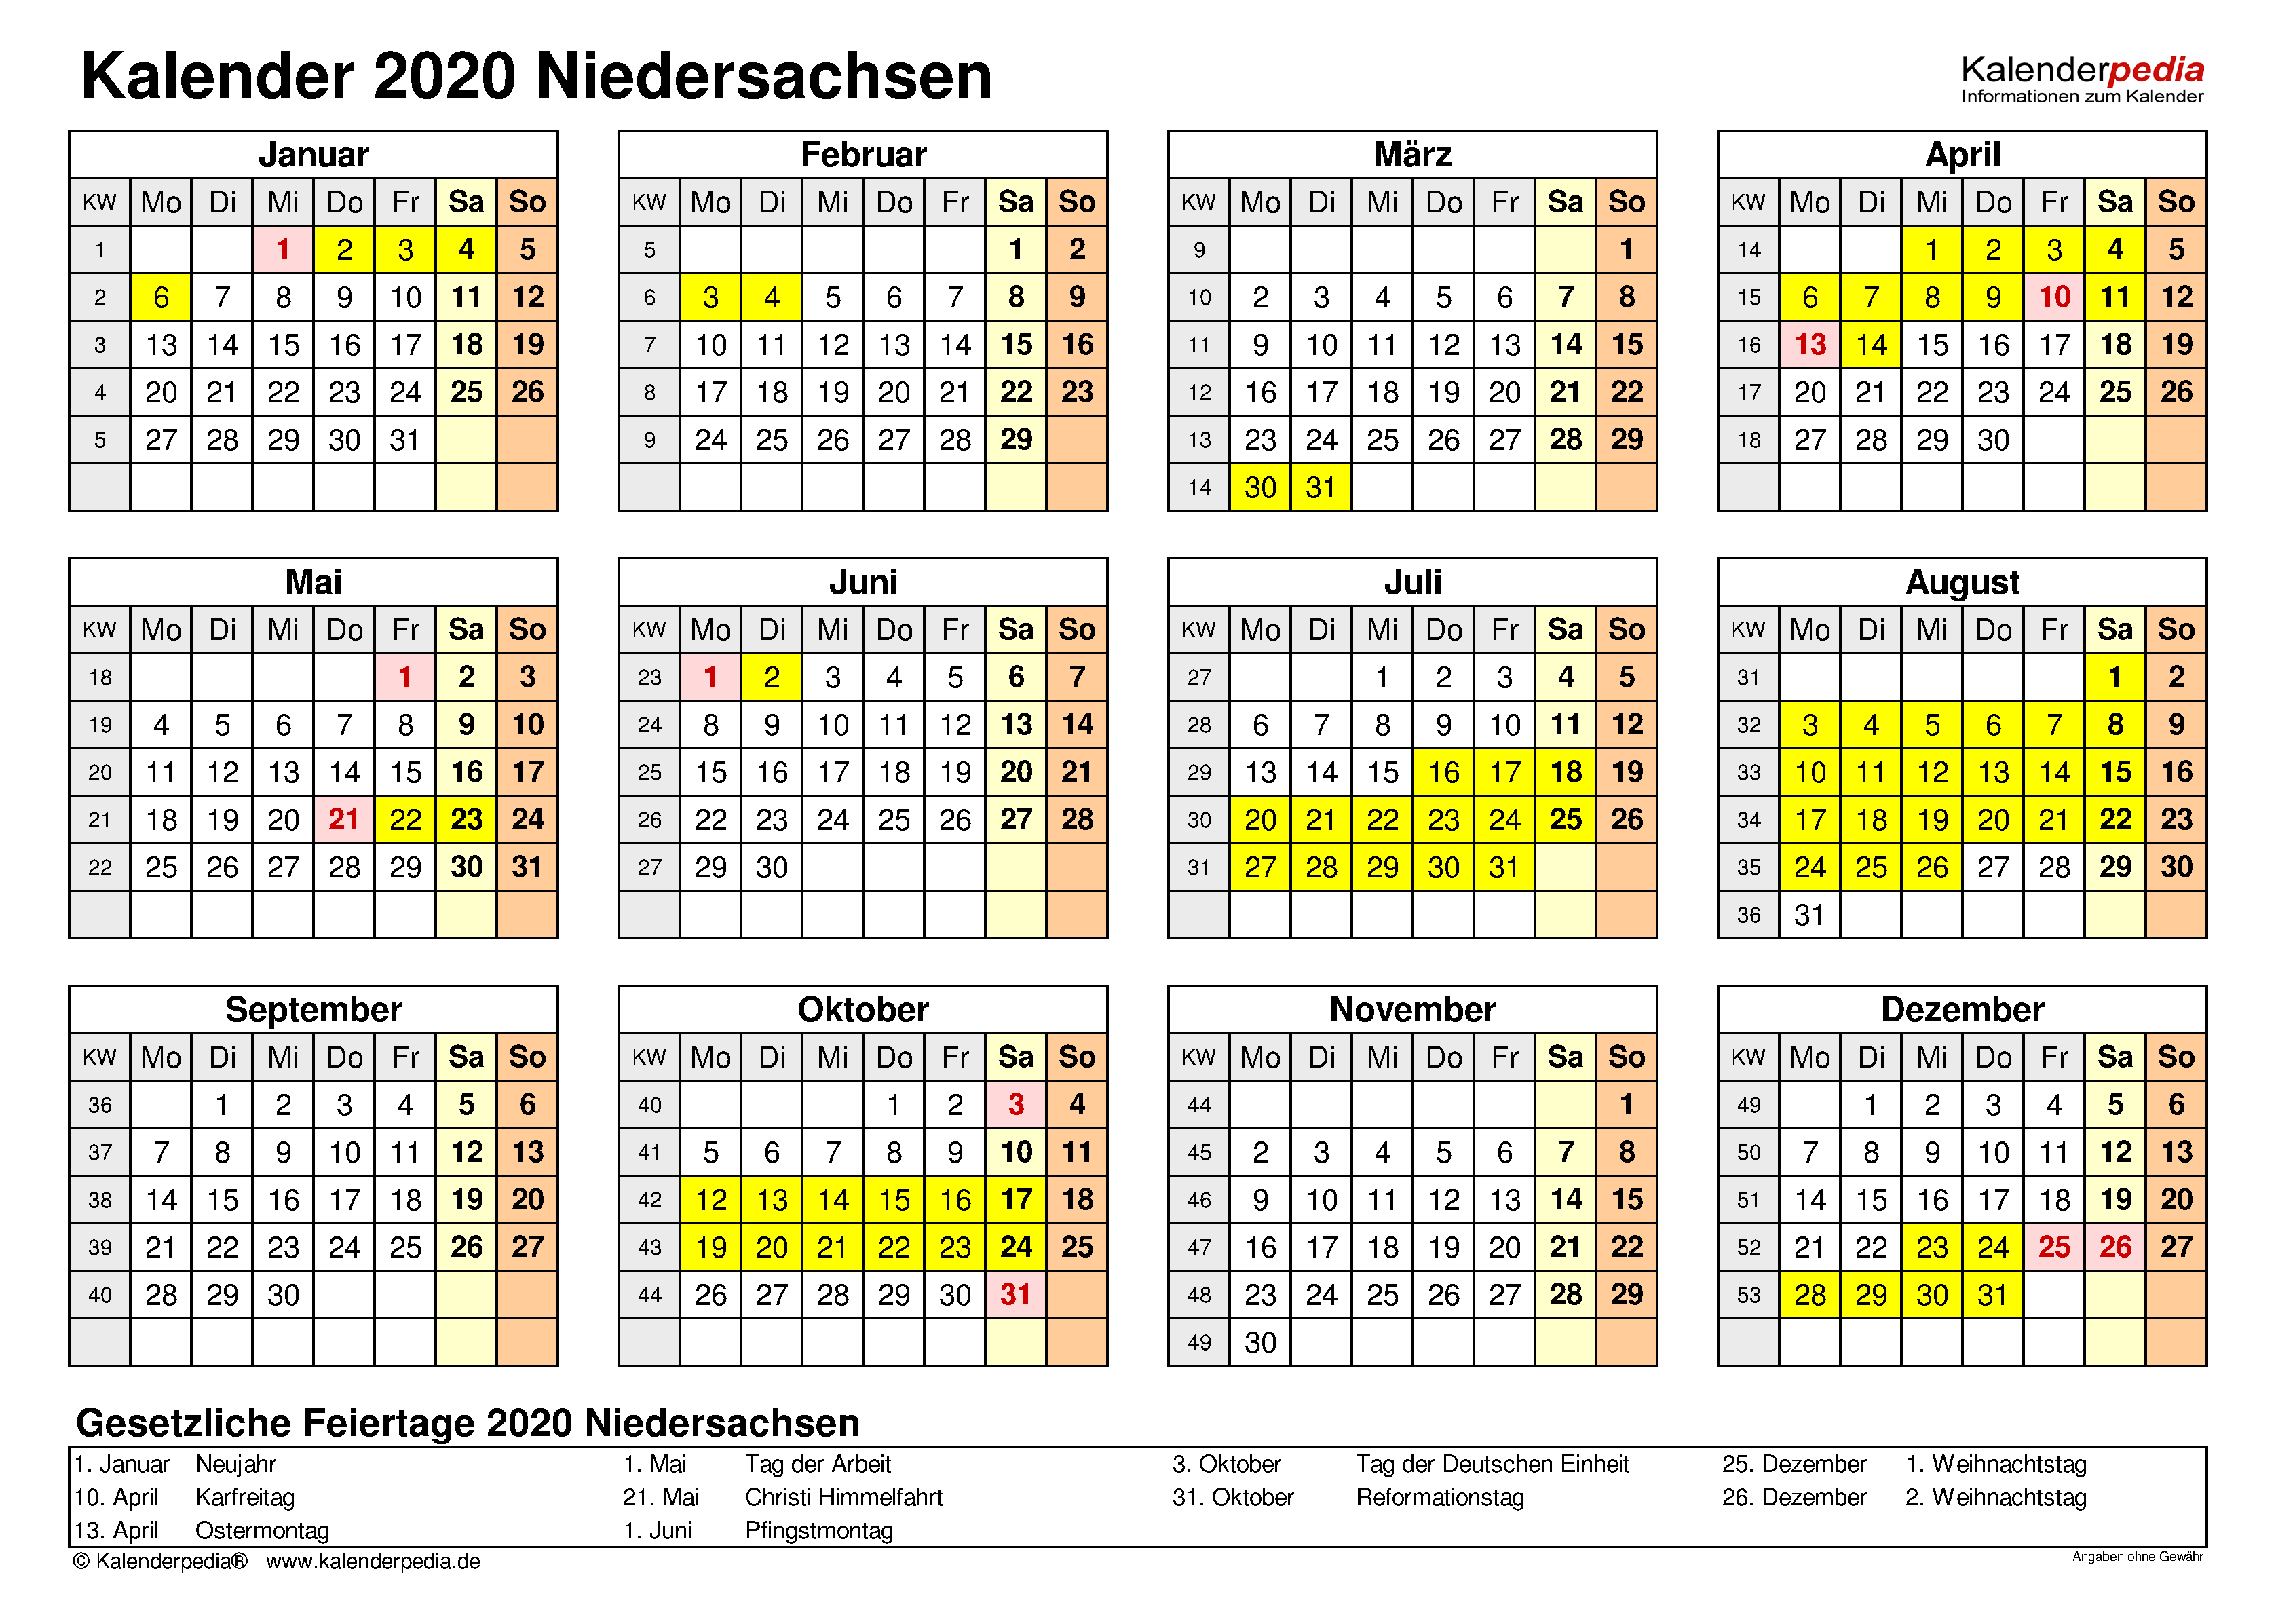 kalender 2020 excel niedersachsen